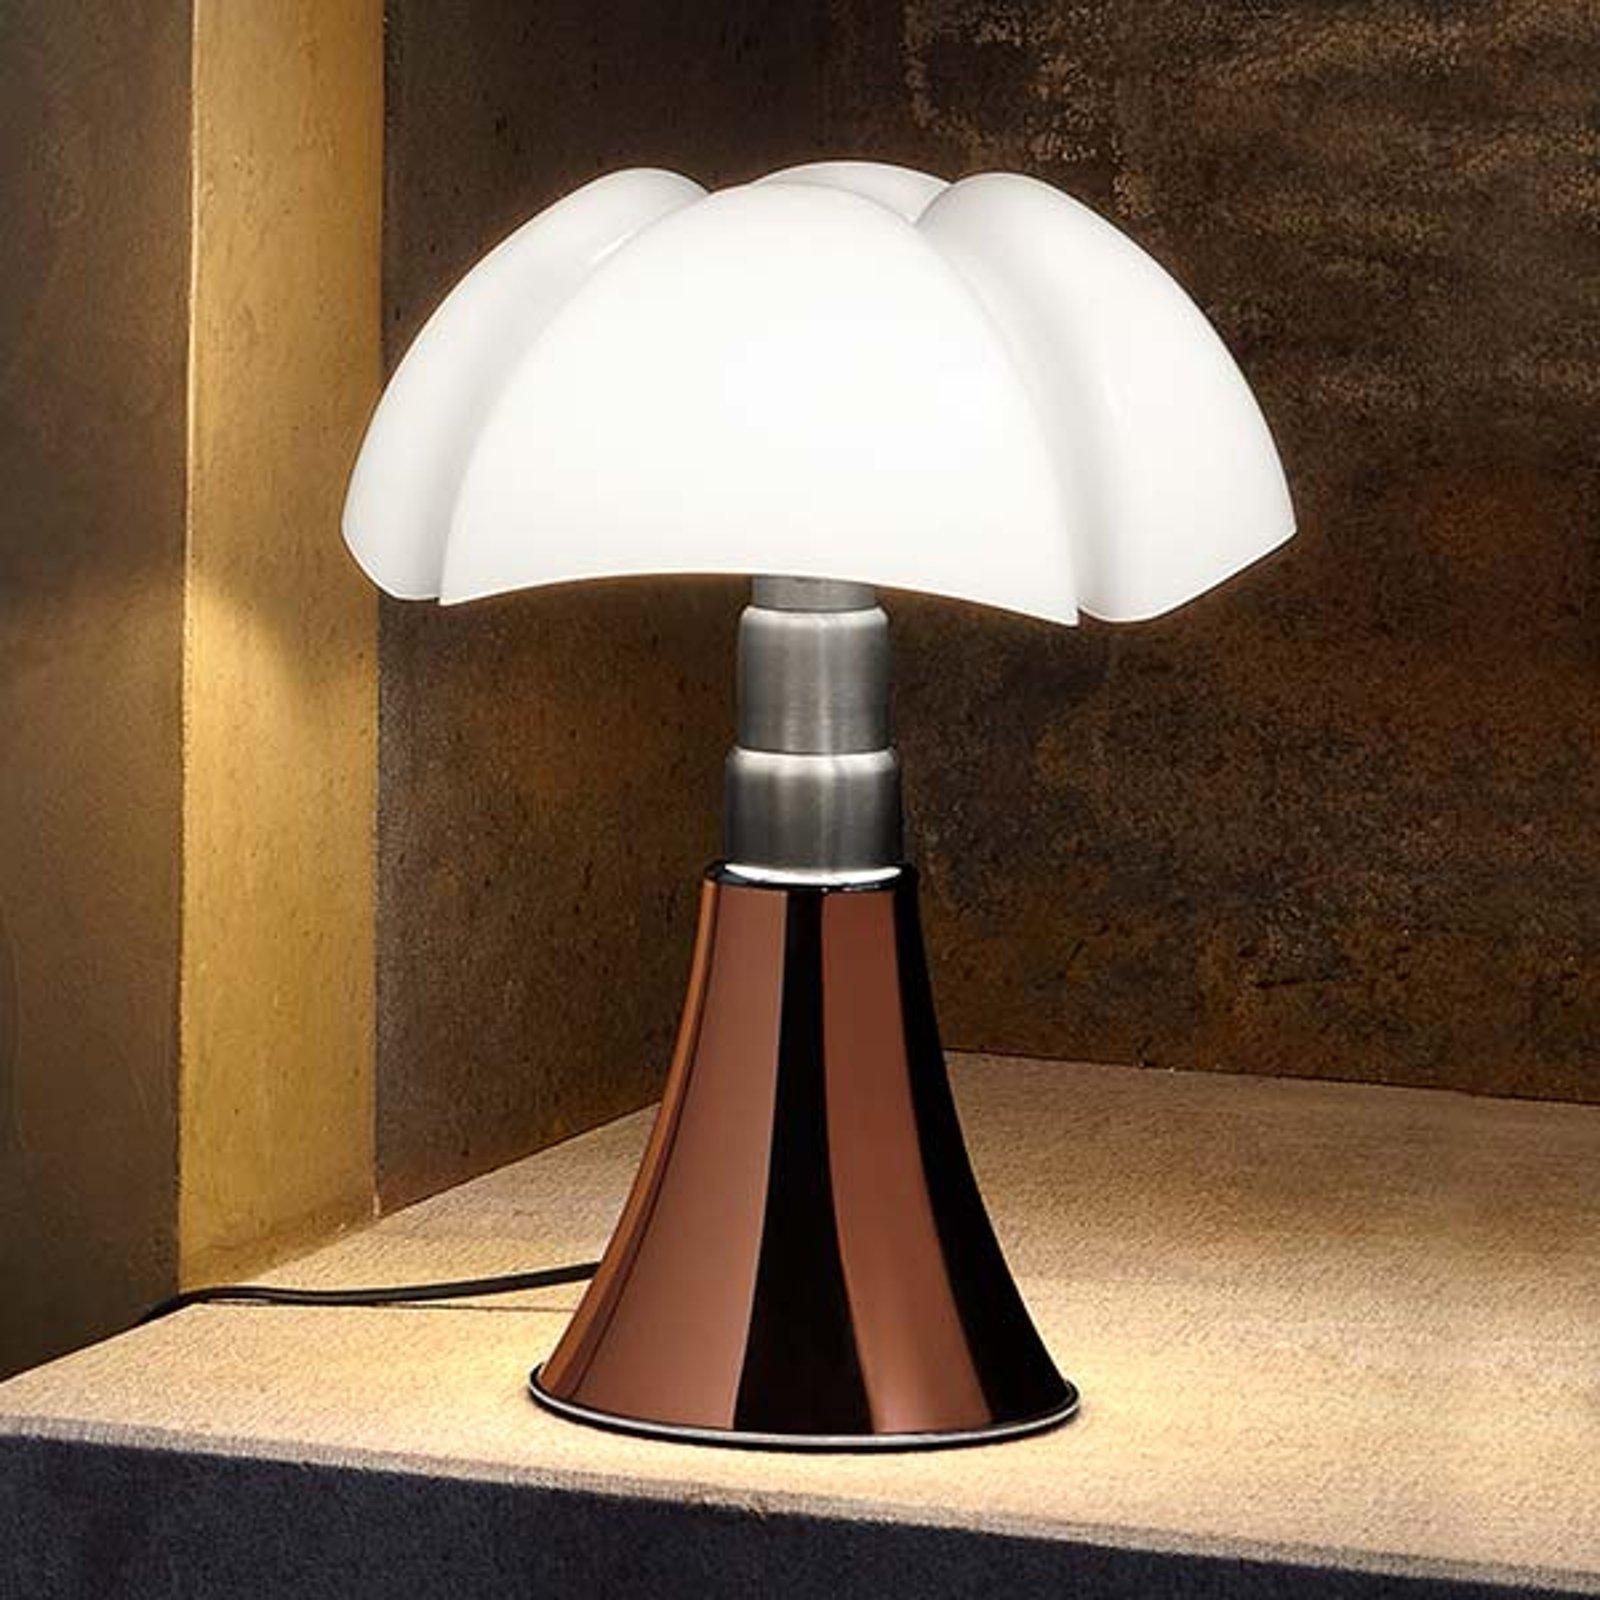 Martinelli Luce Minipipistrello bordlampe kobber